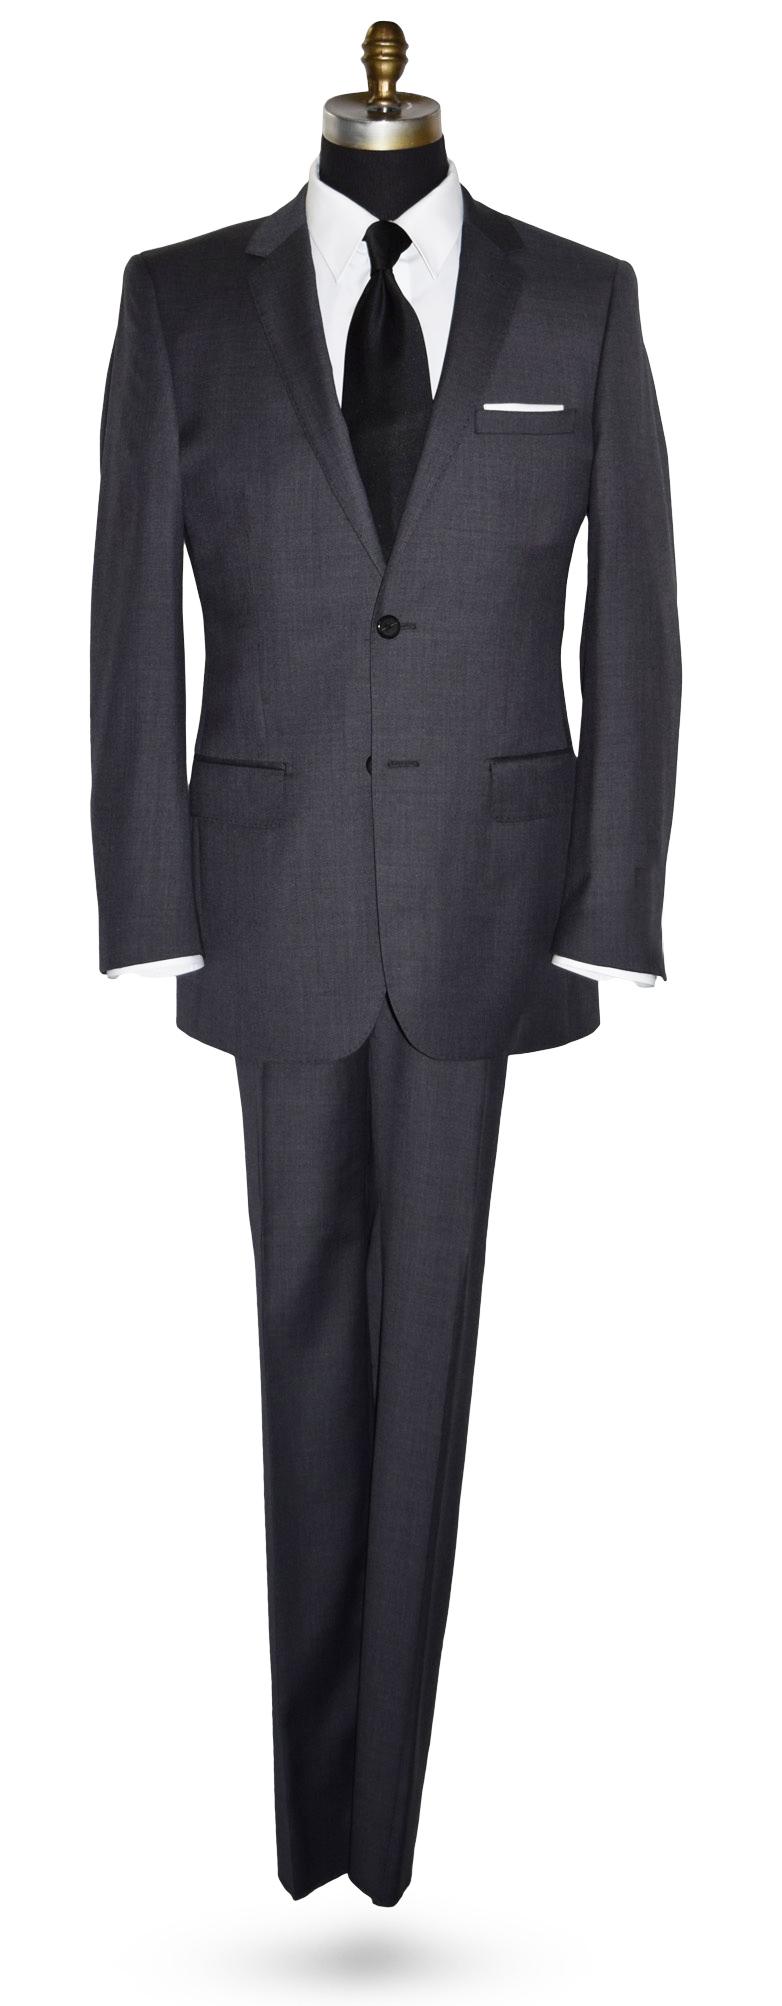 Charcoal Gray Suit Coat and Pants Set